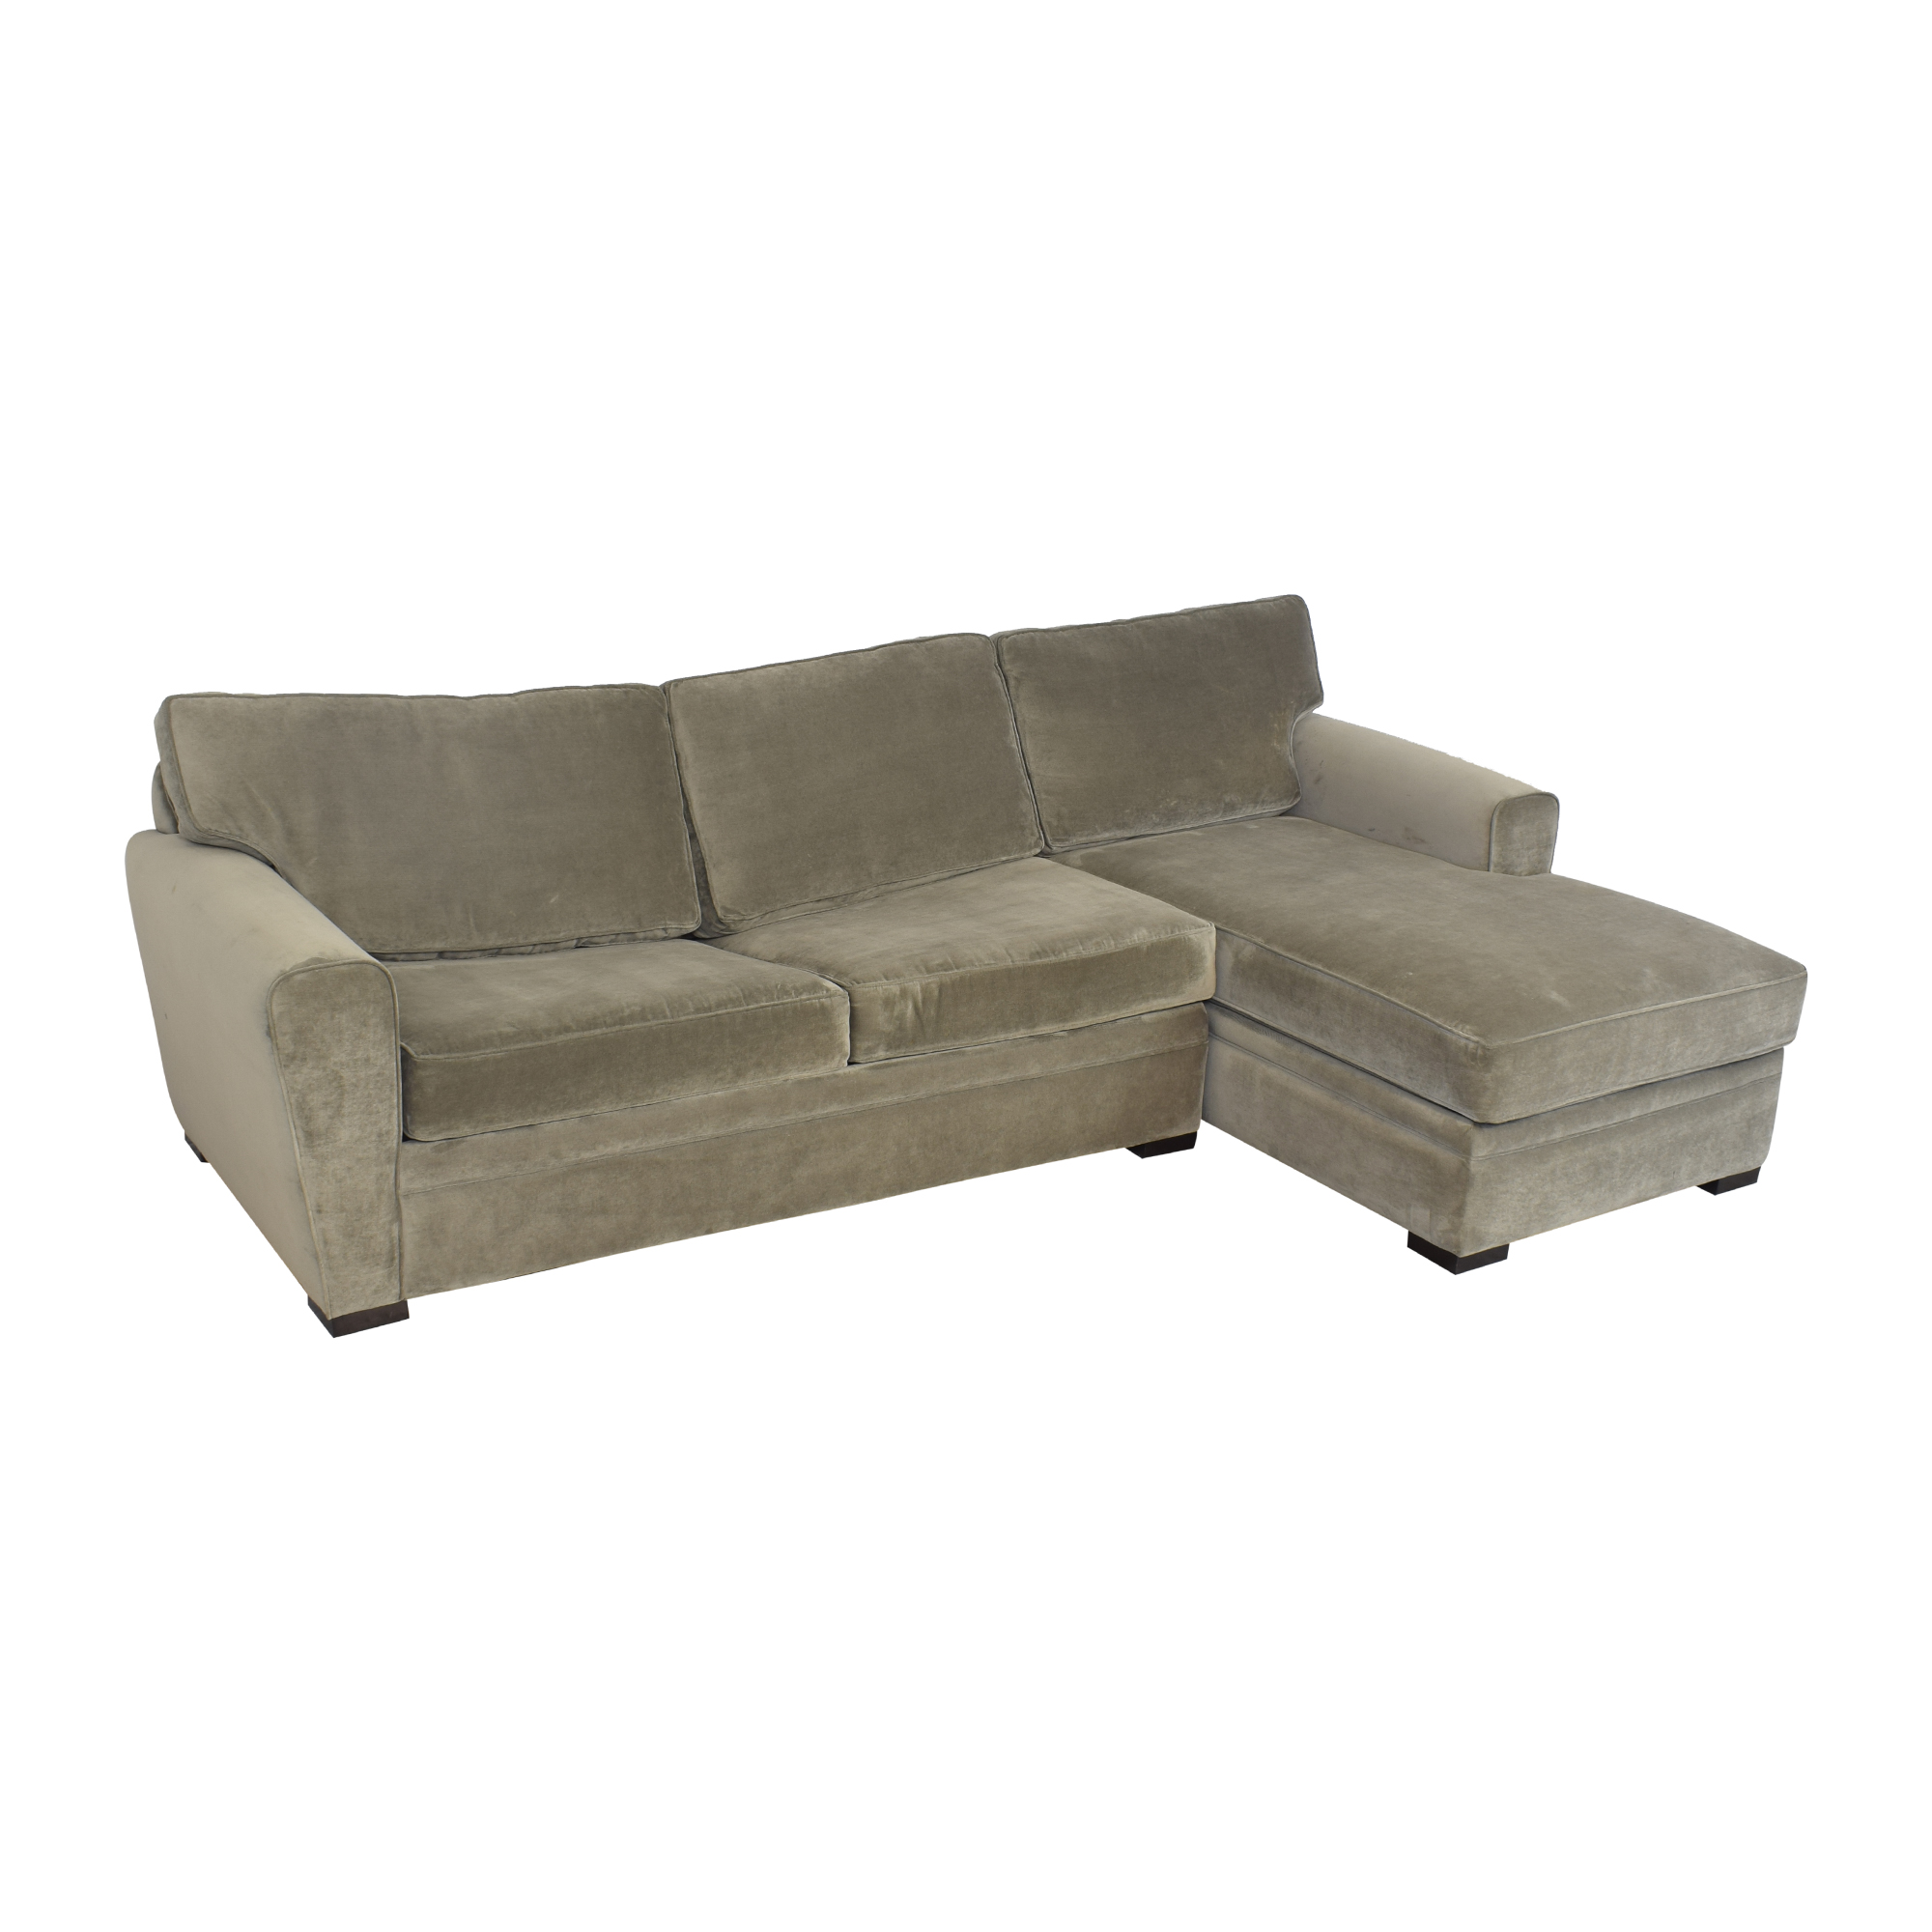 Raymour & Flanigan Raymour & Flanigan Artemis II Sectional Sofa with Sleeper used